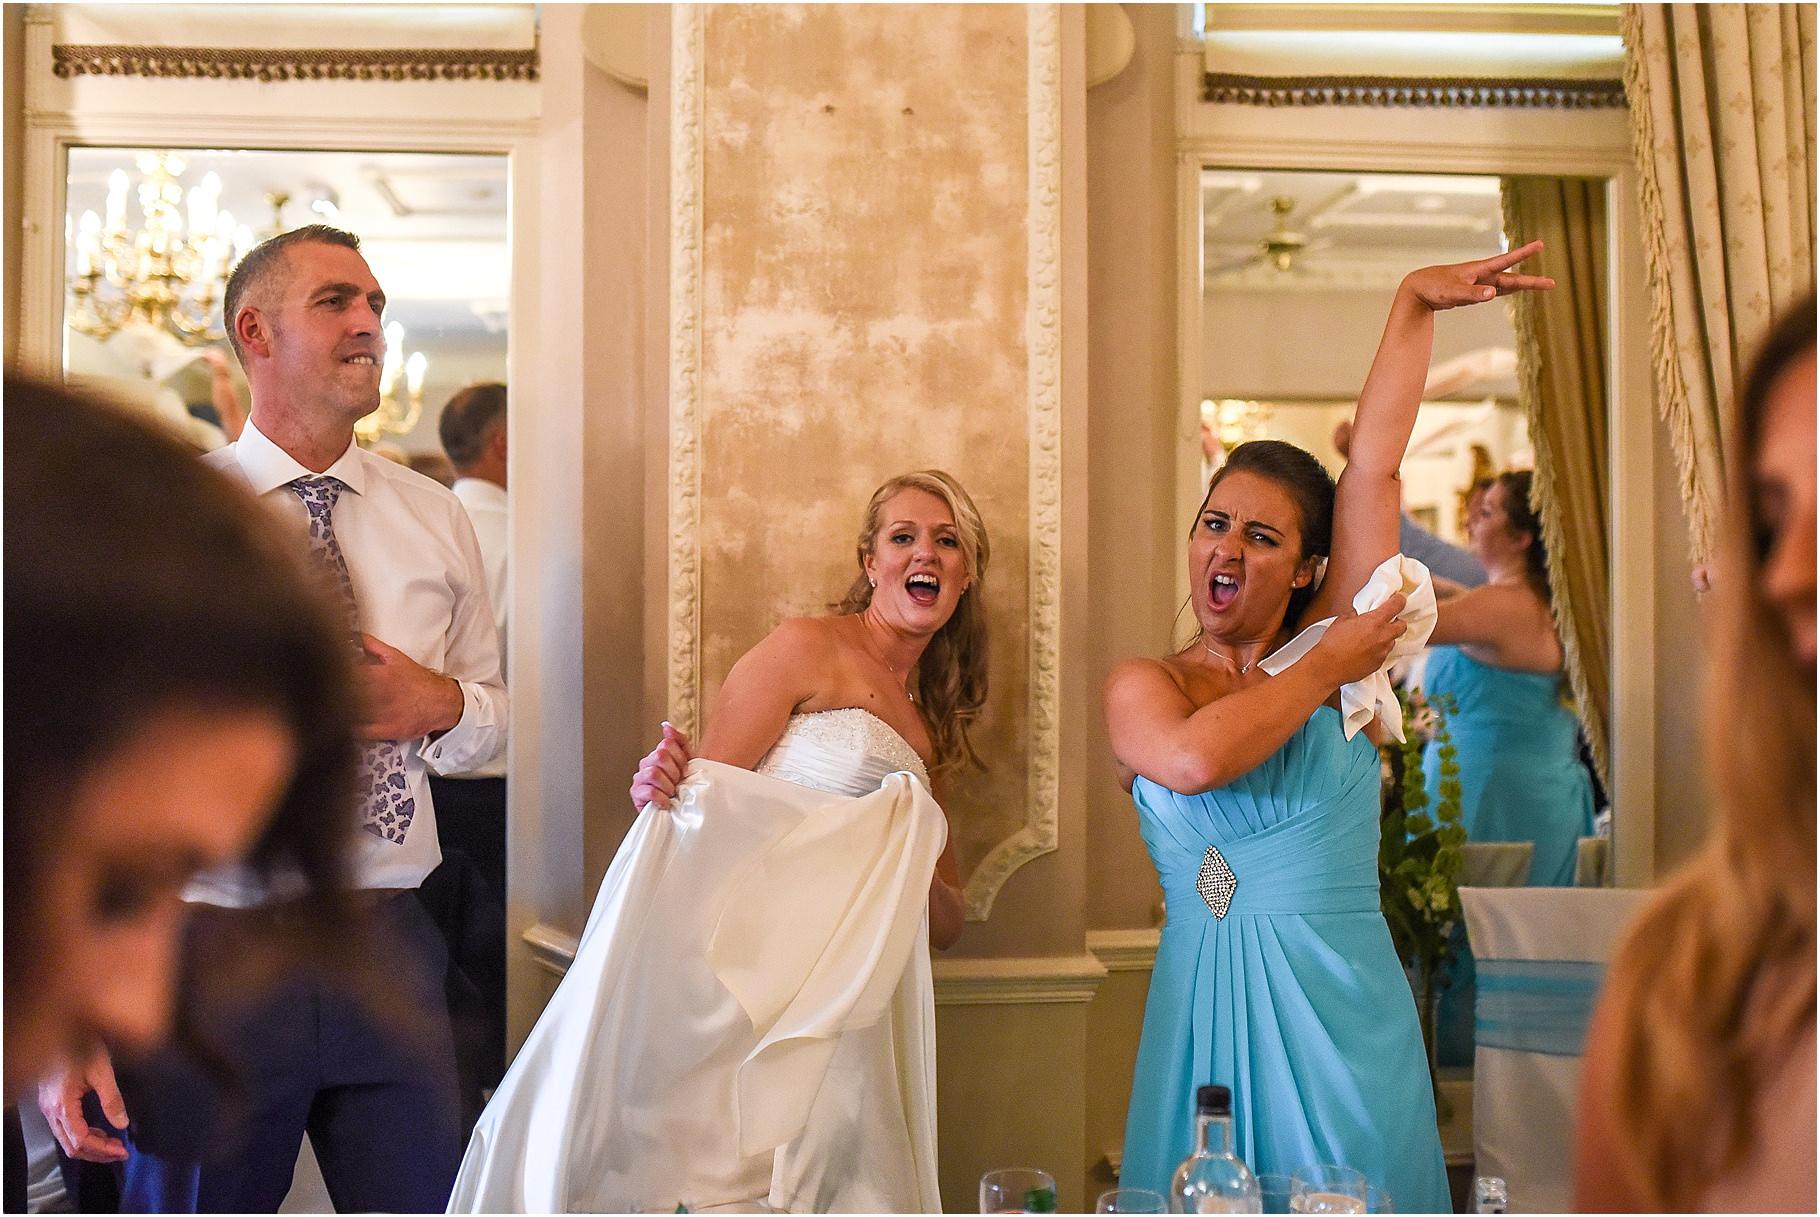 dan-wootton-photography-2017-weddings-077.jpg